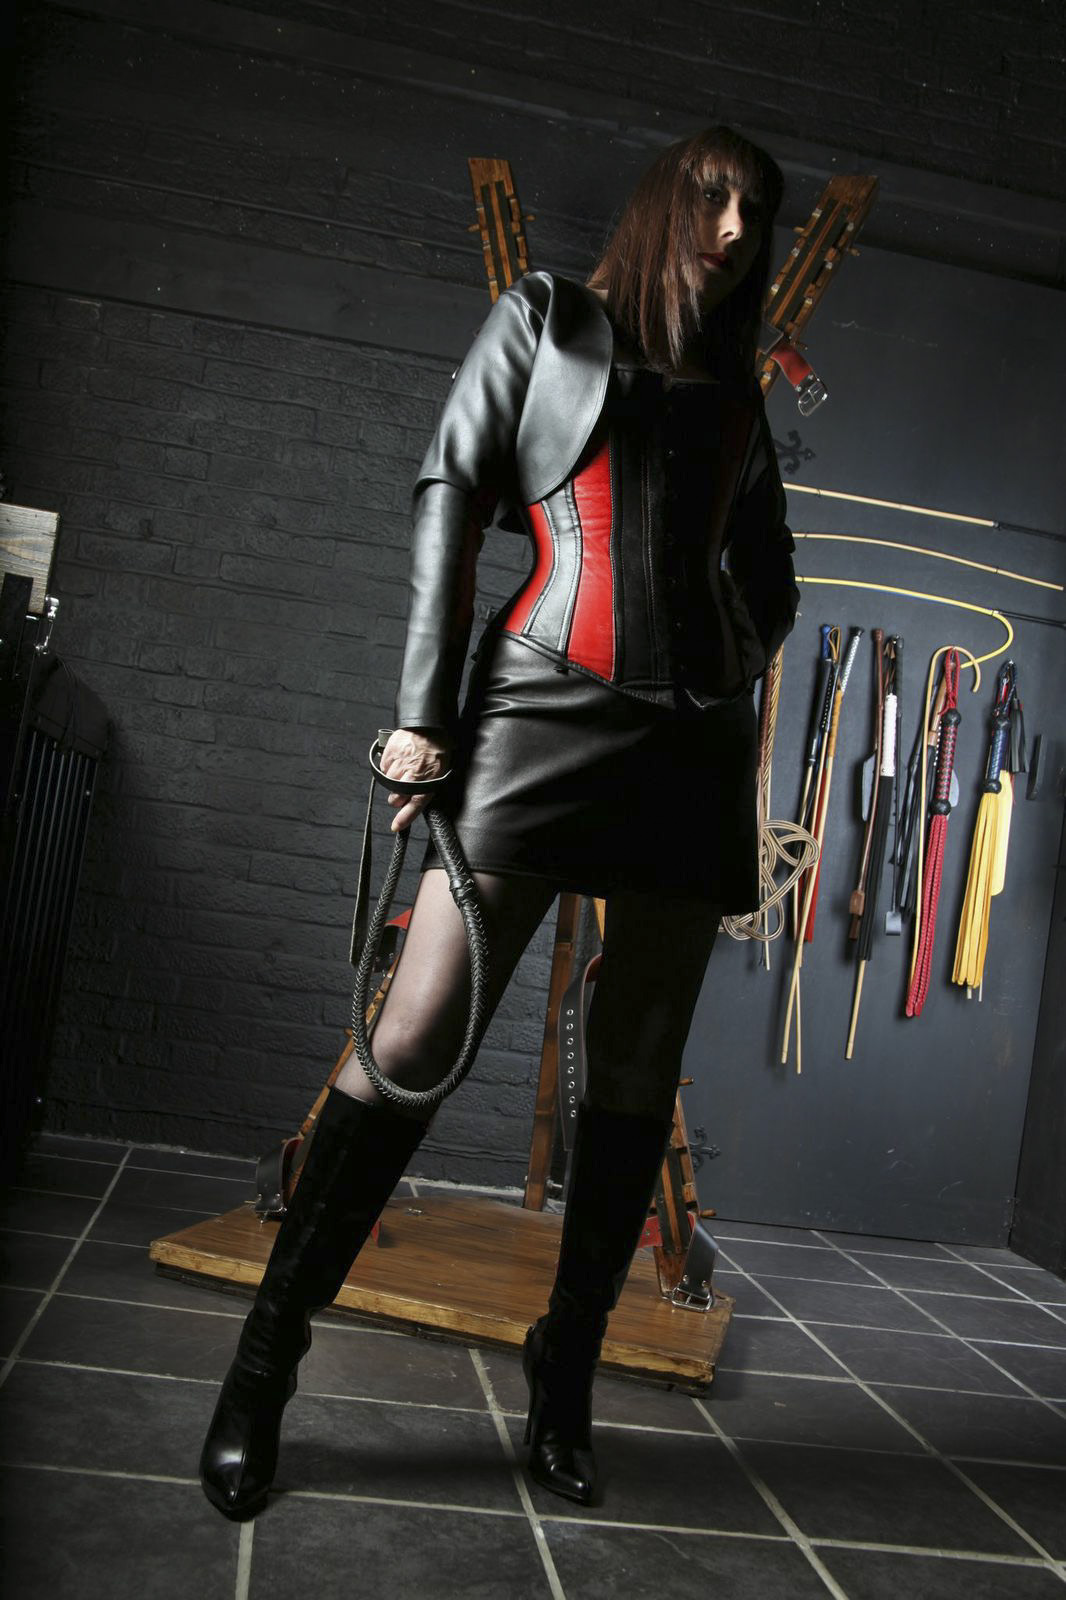 Mistress 4 2 slaves girls - 1 2